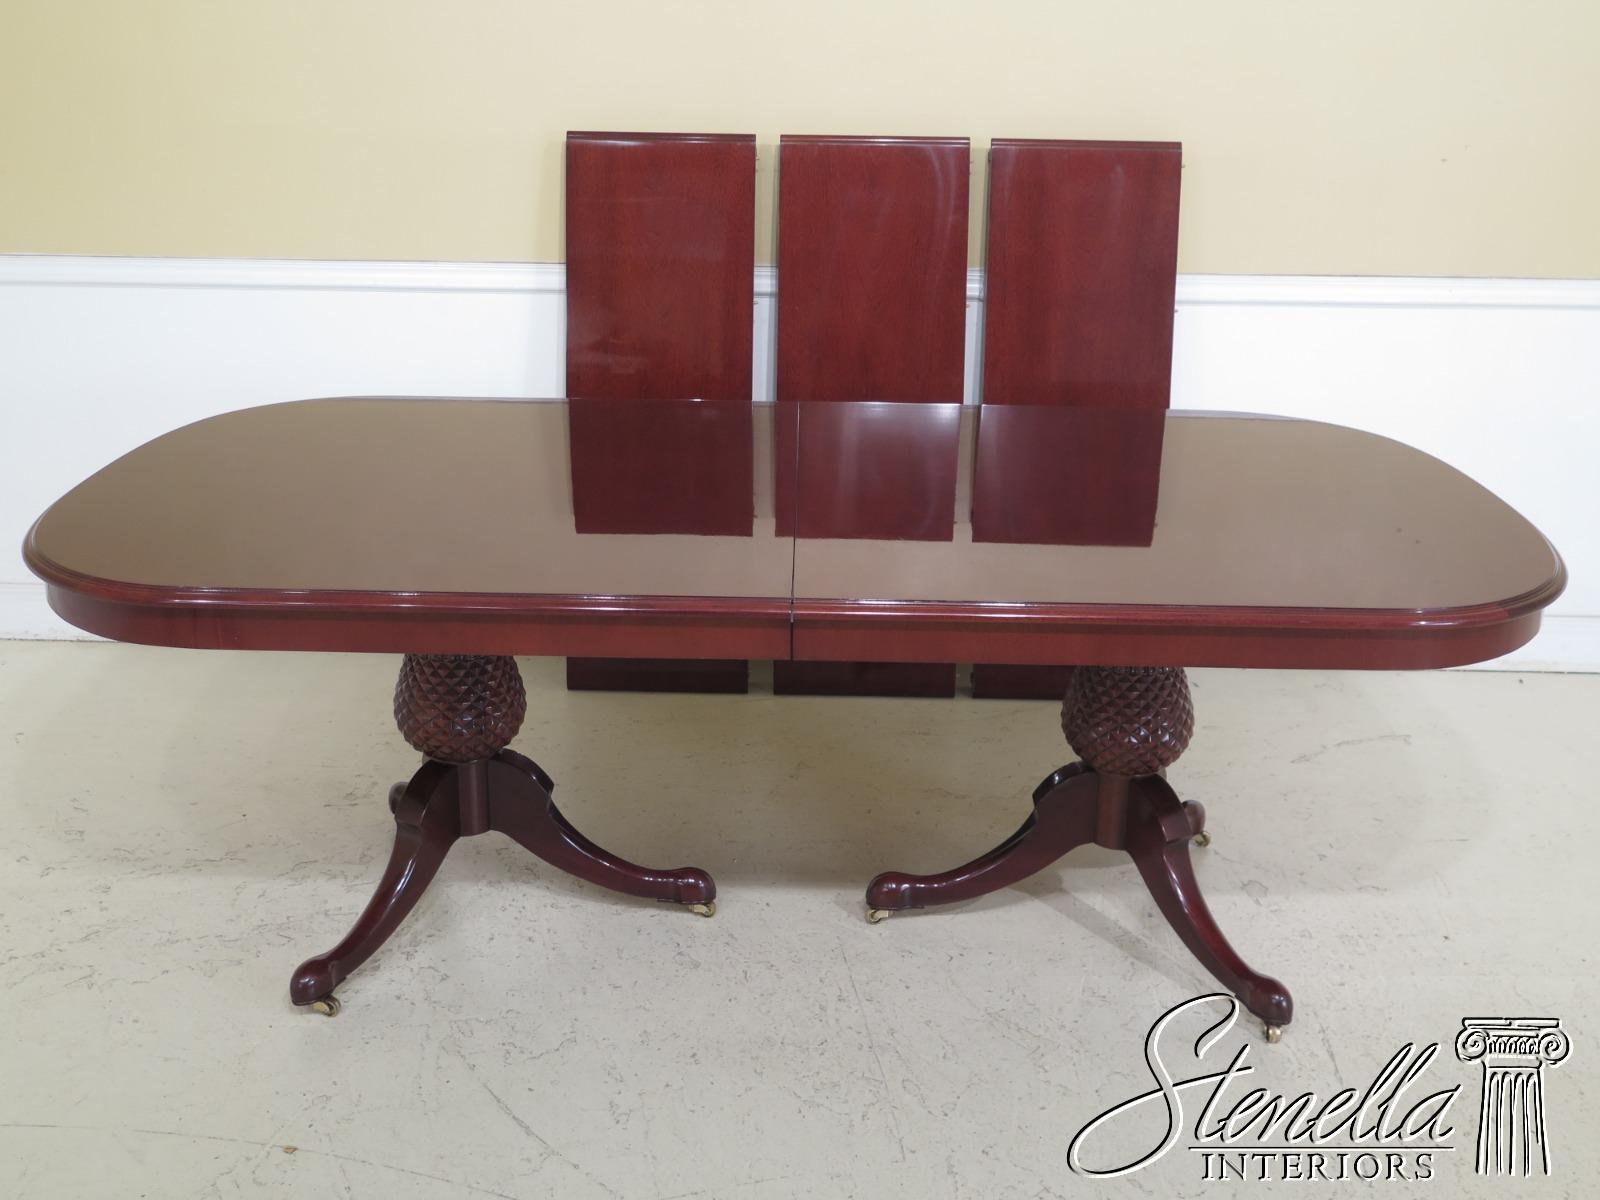 L47845ec Kindel Varney Collection Pineapple Base Mahogany Dining Room Table Ebay